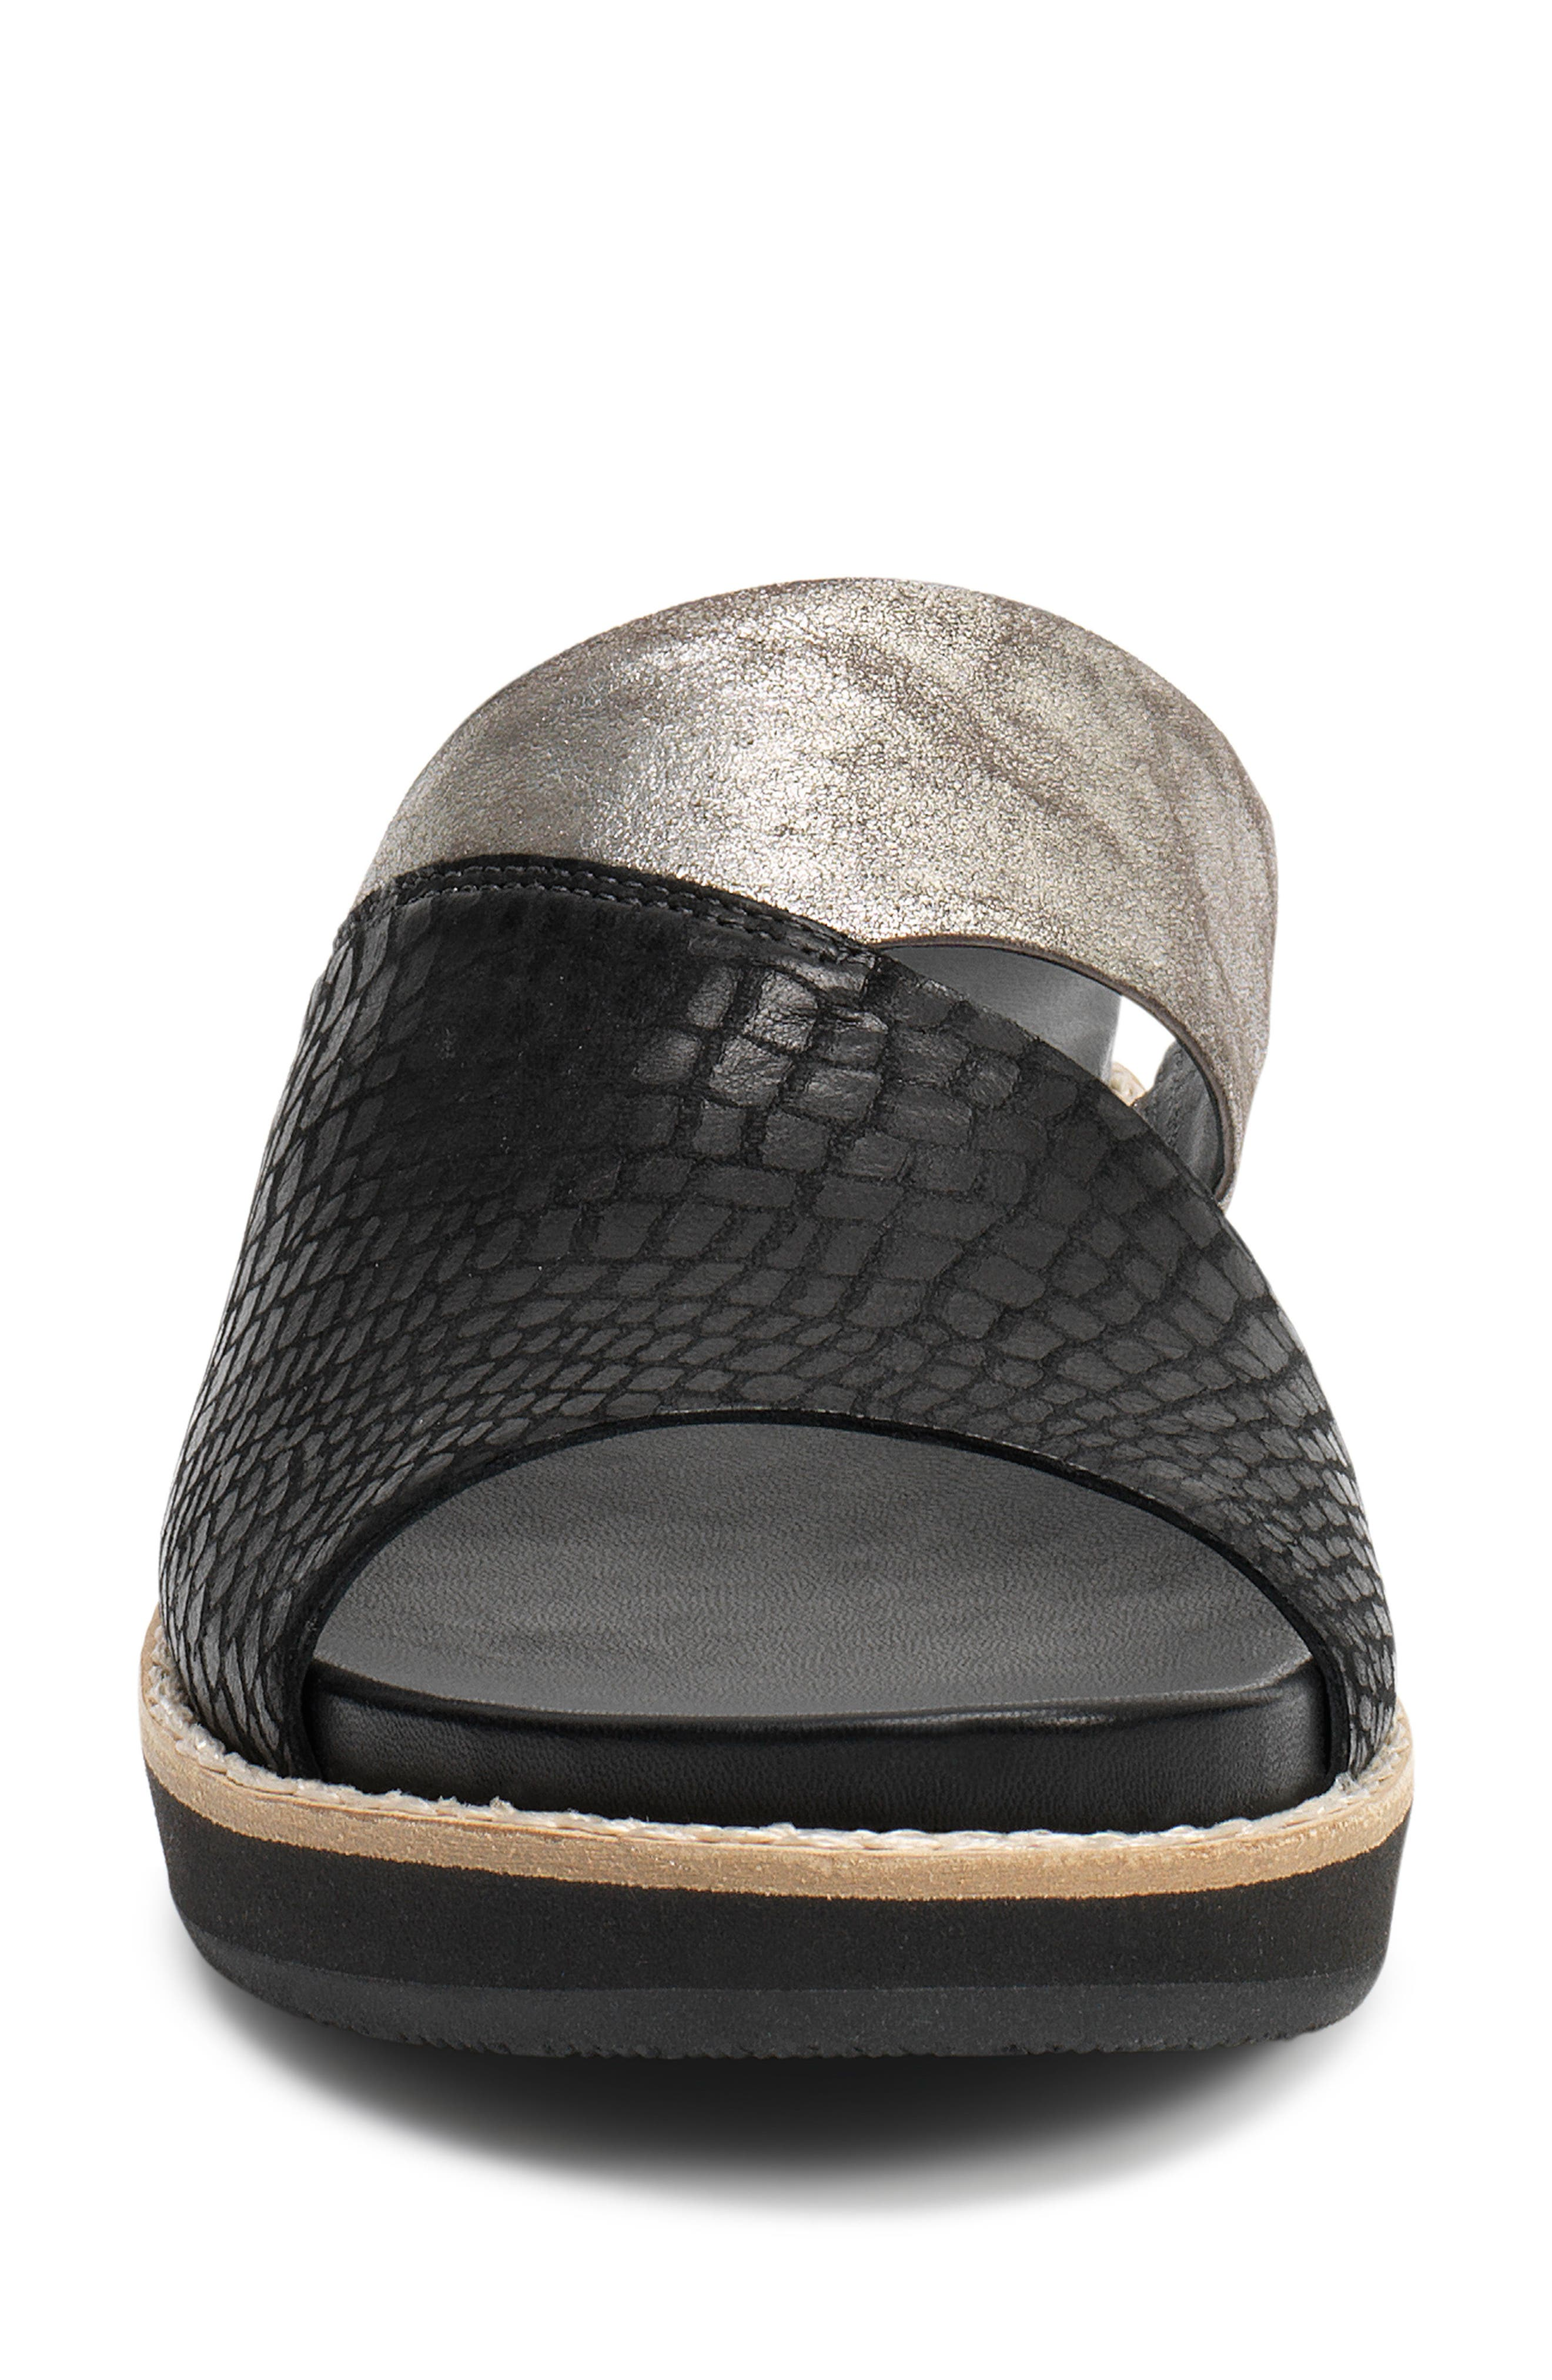 Codi Sandal,                             Alternate thumbnail 4, color,                             Black Embossed Leather